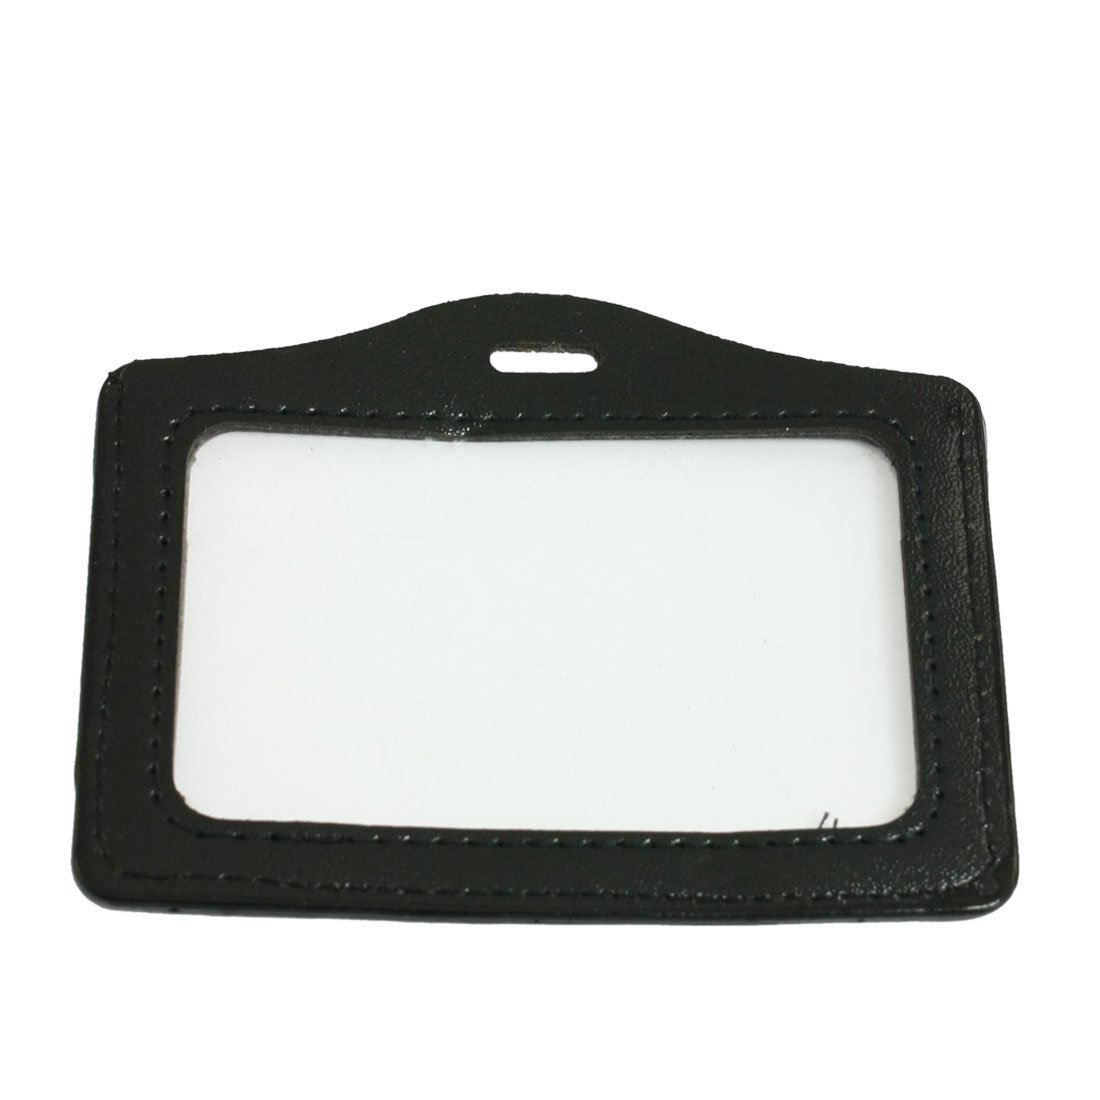 10 Pcs Black Clear Business ID Card Badge Holder